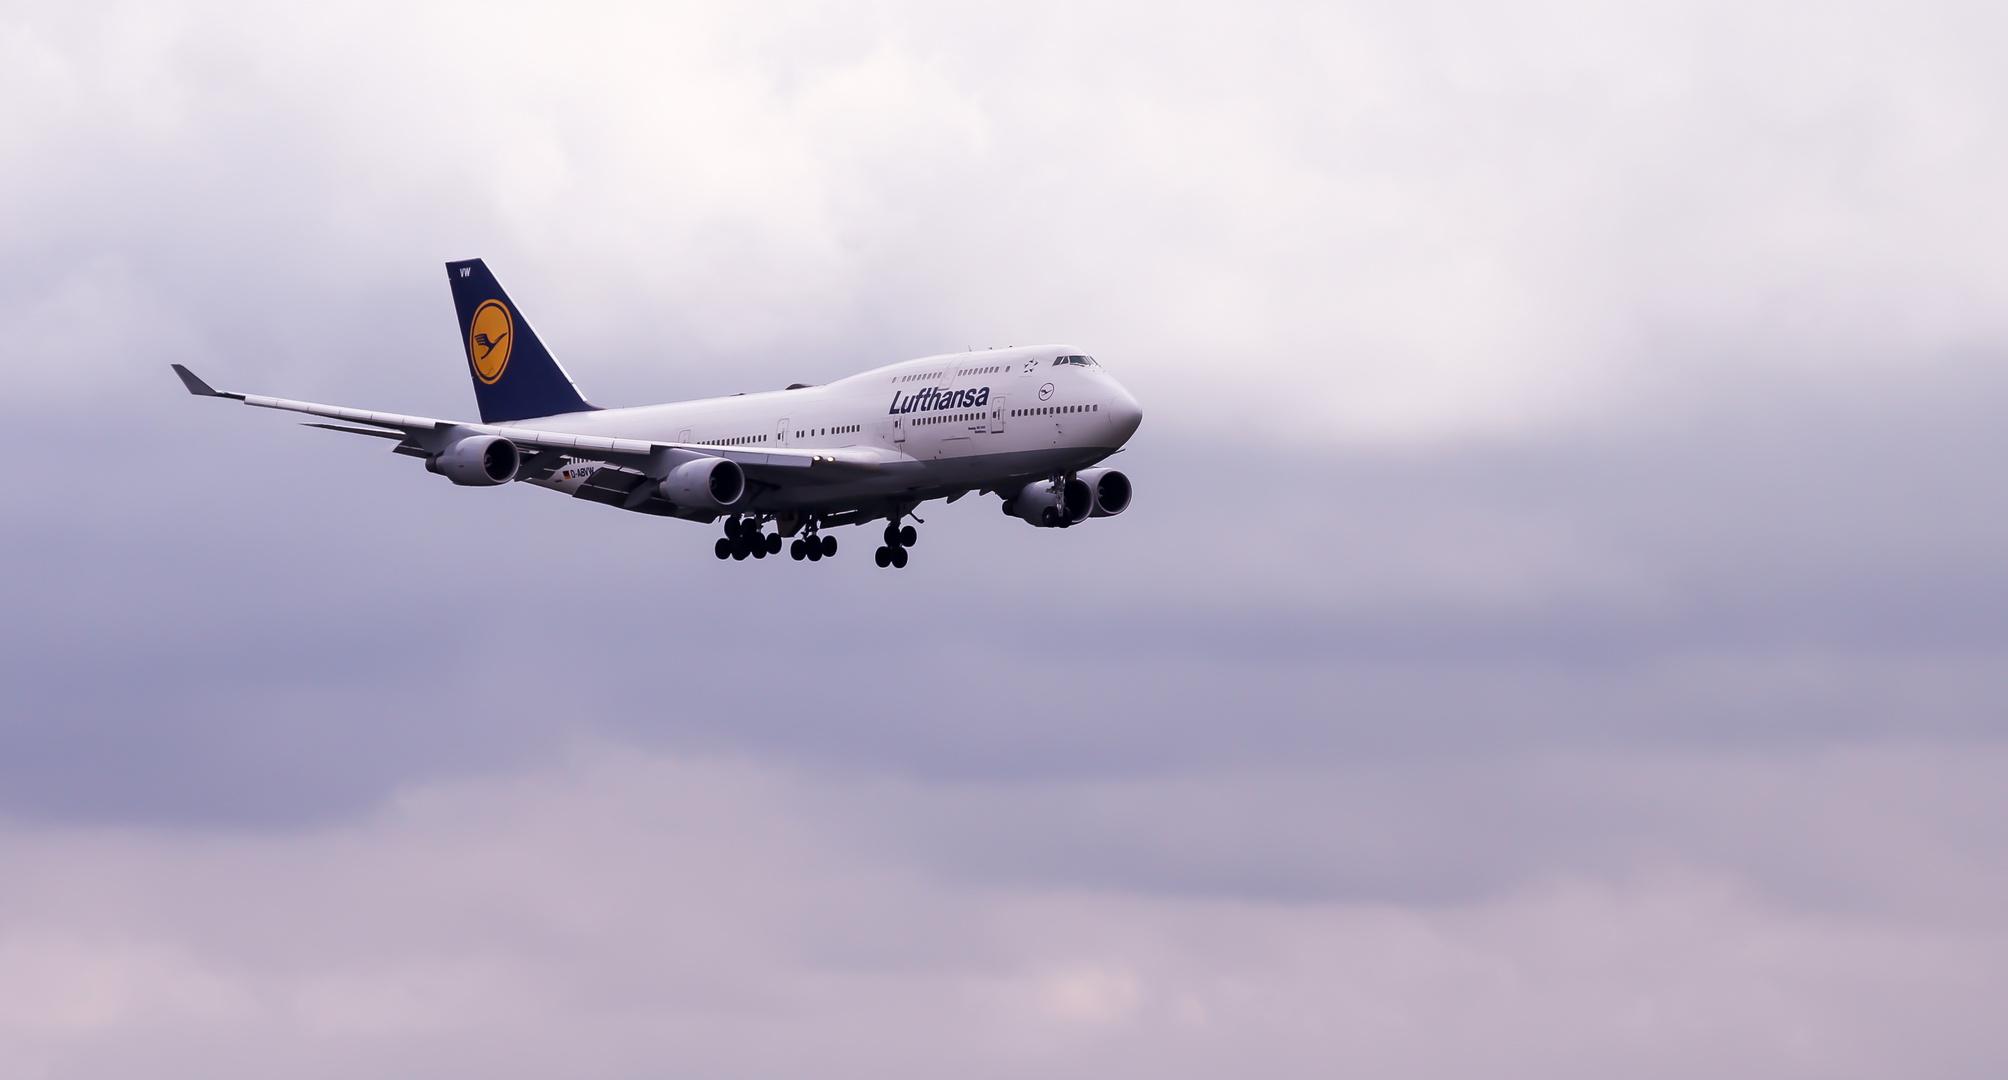 Boing 747 im Anflug